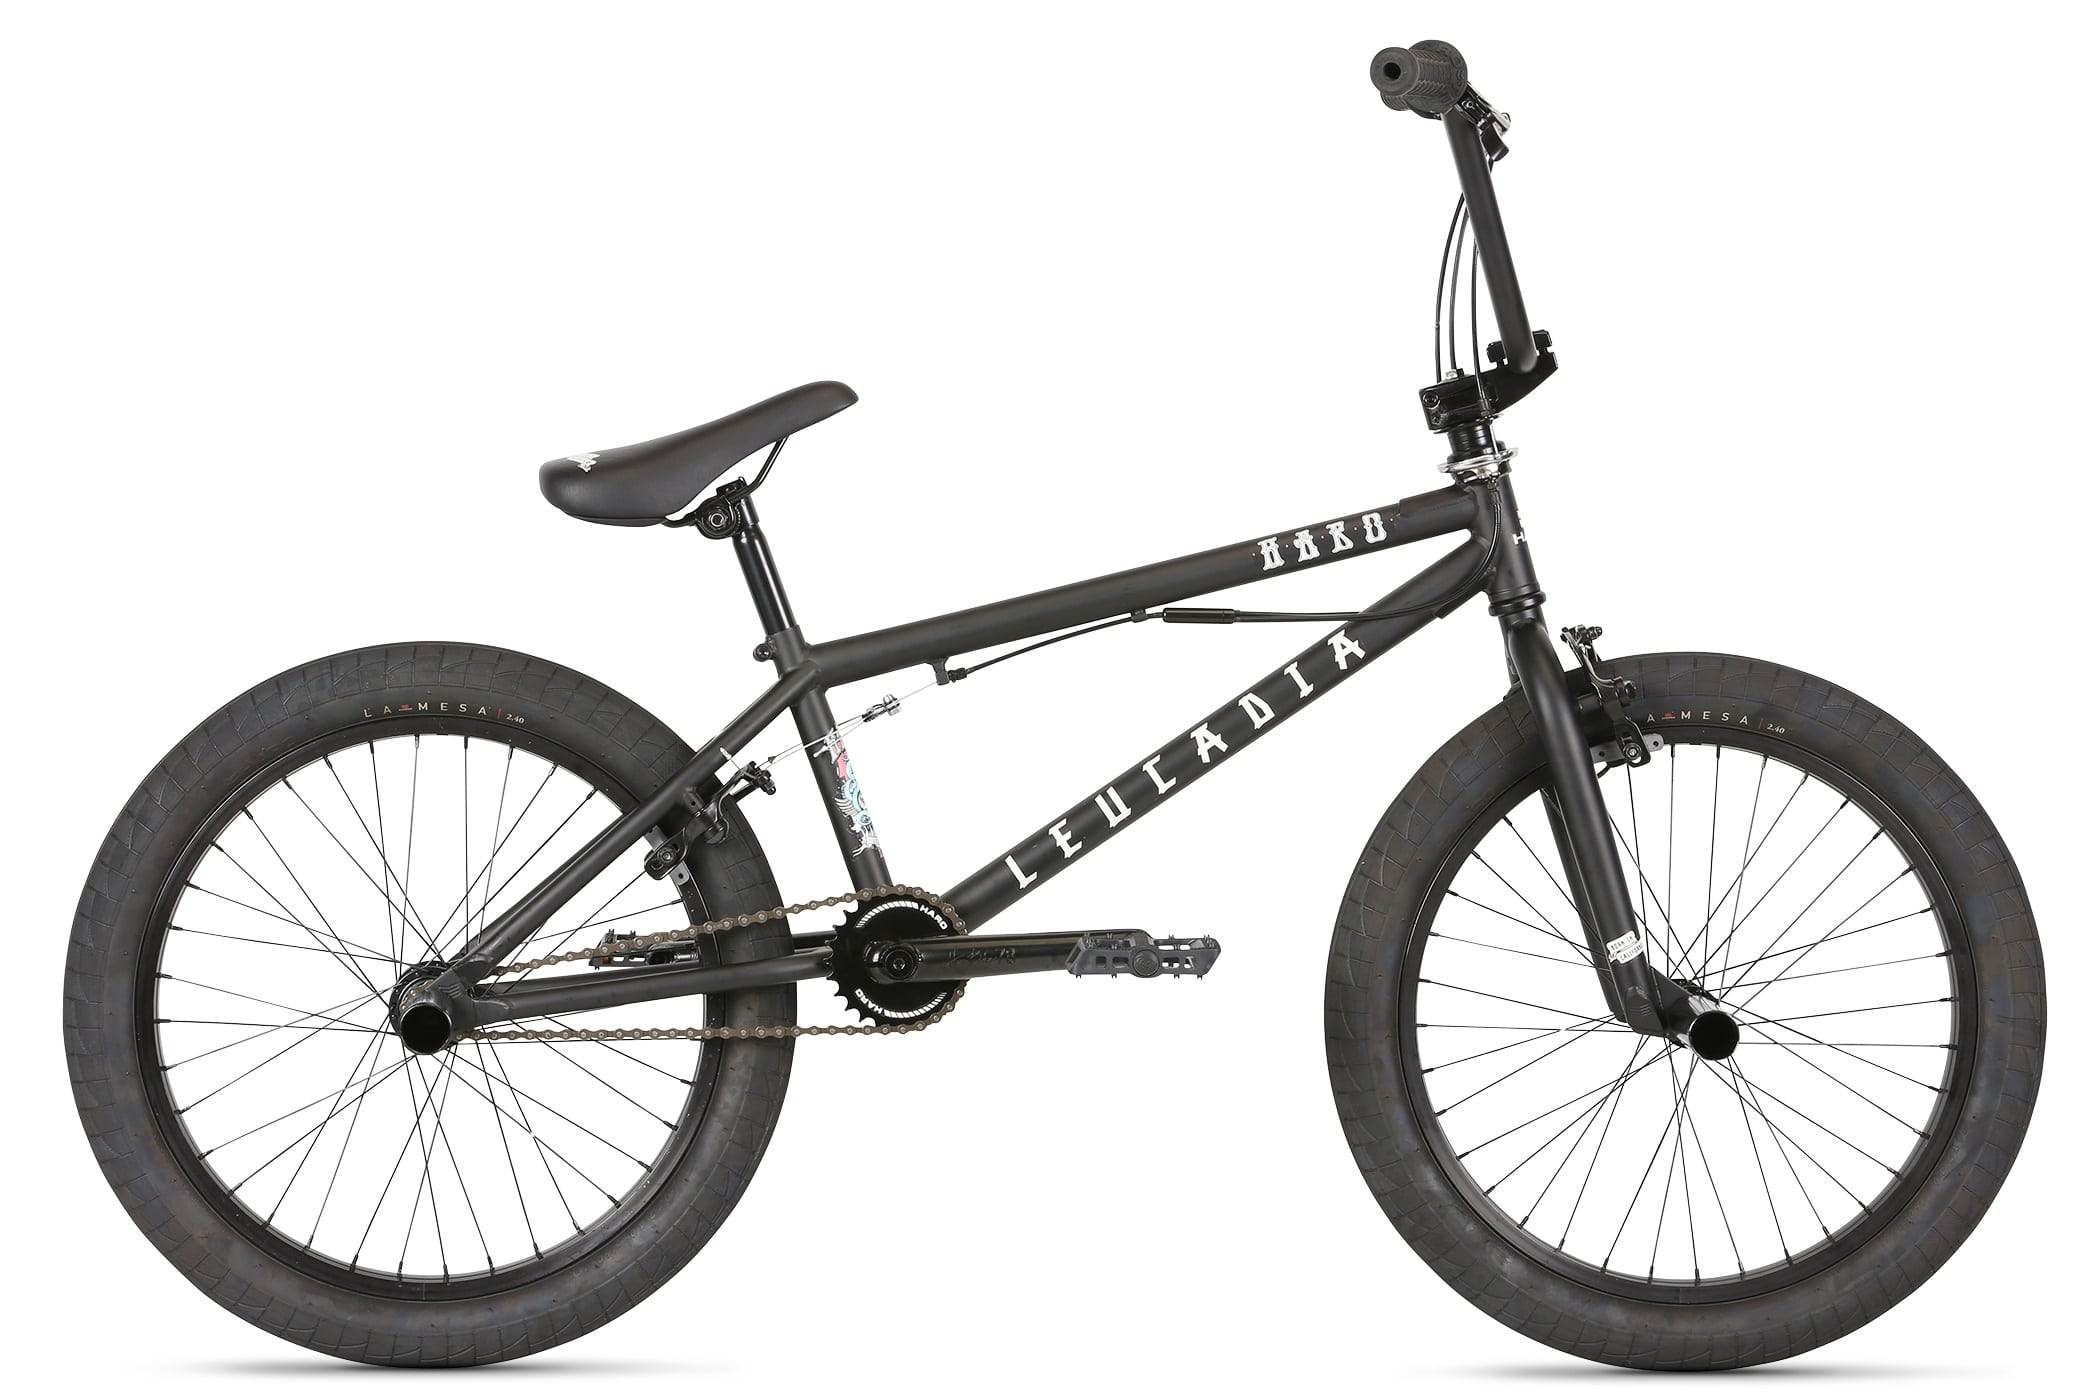 Haro Ποδήλατο Bmx Leucadia DLX - Ποδήλατα BMX